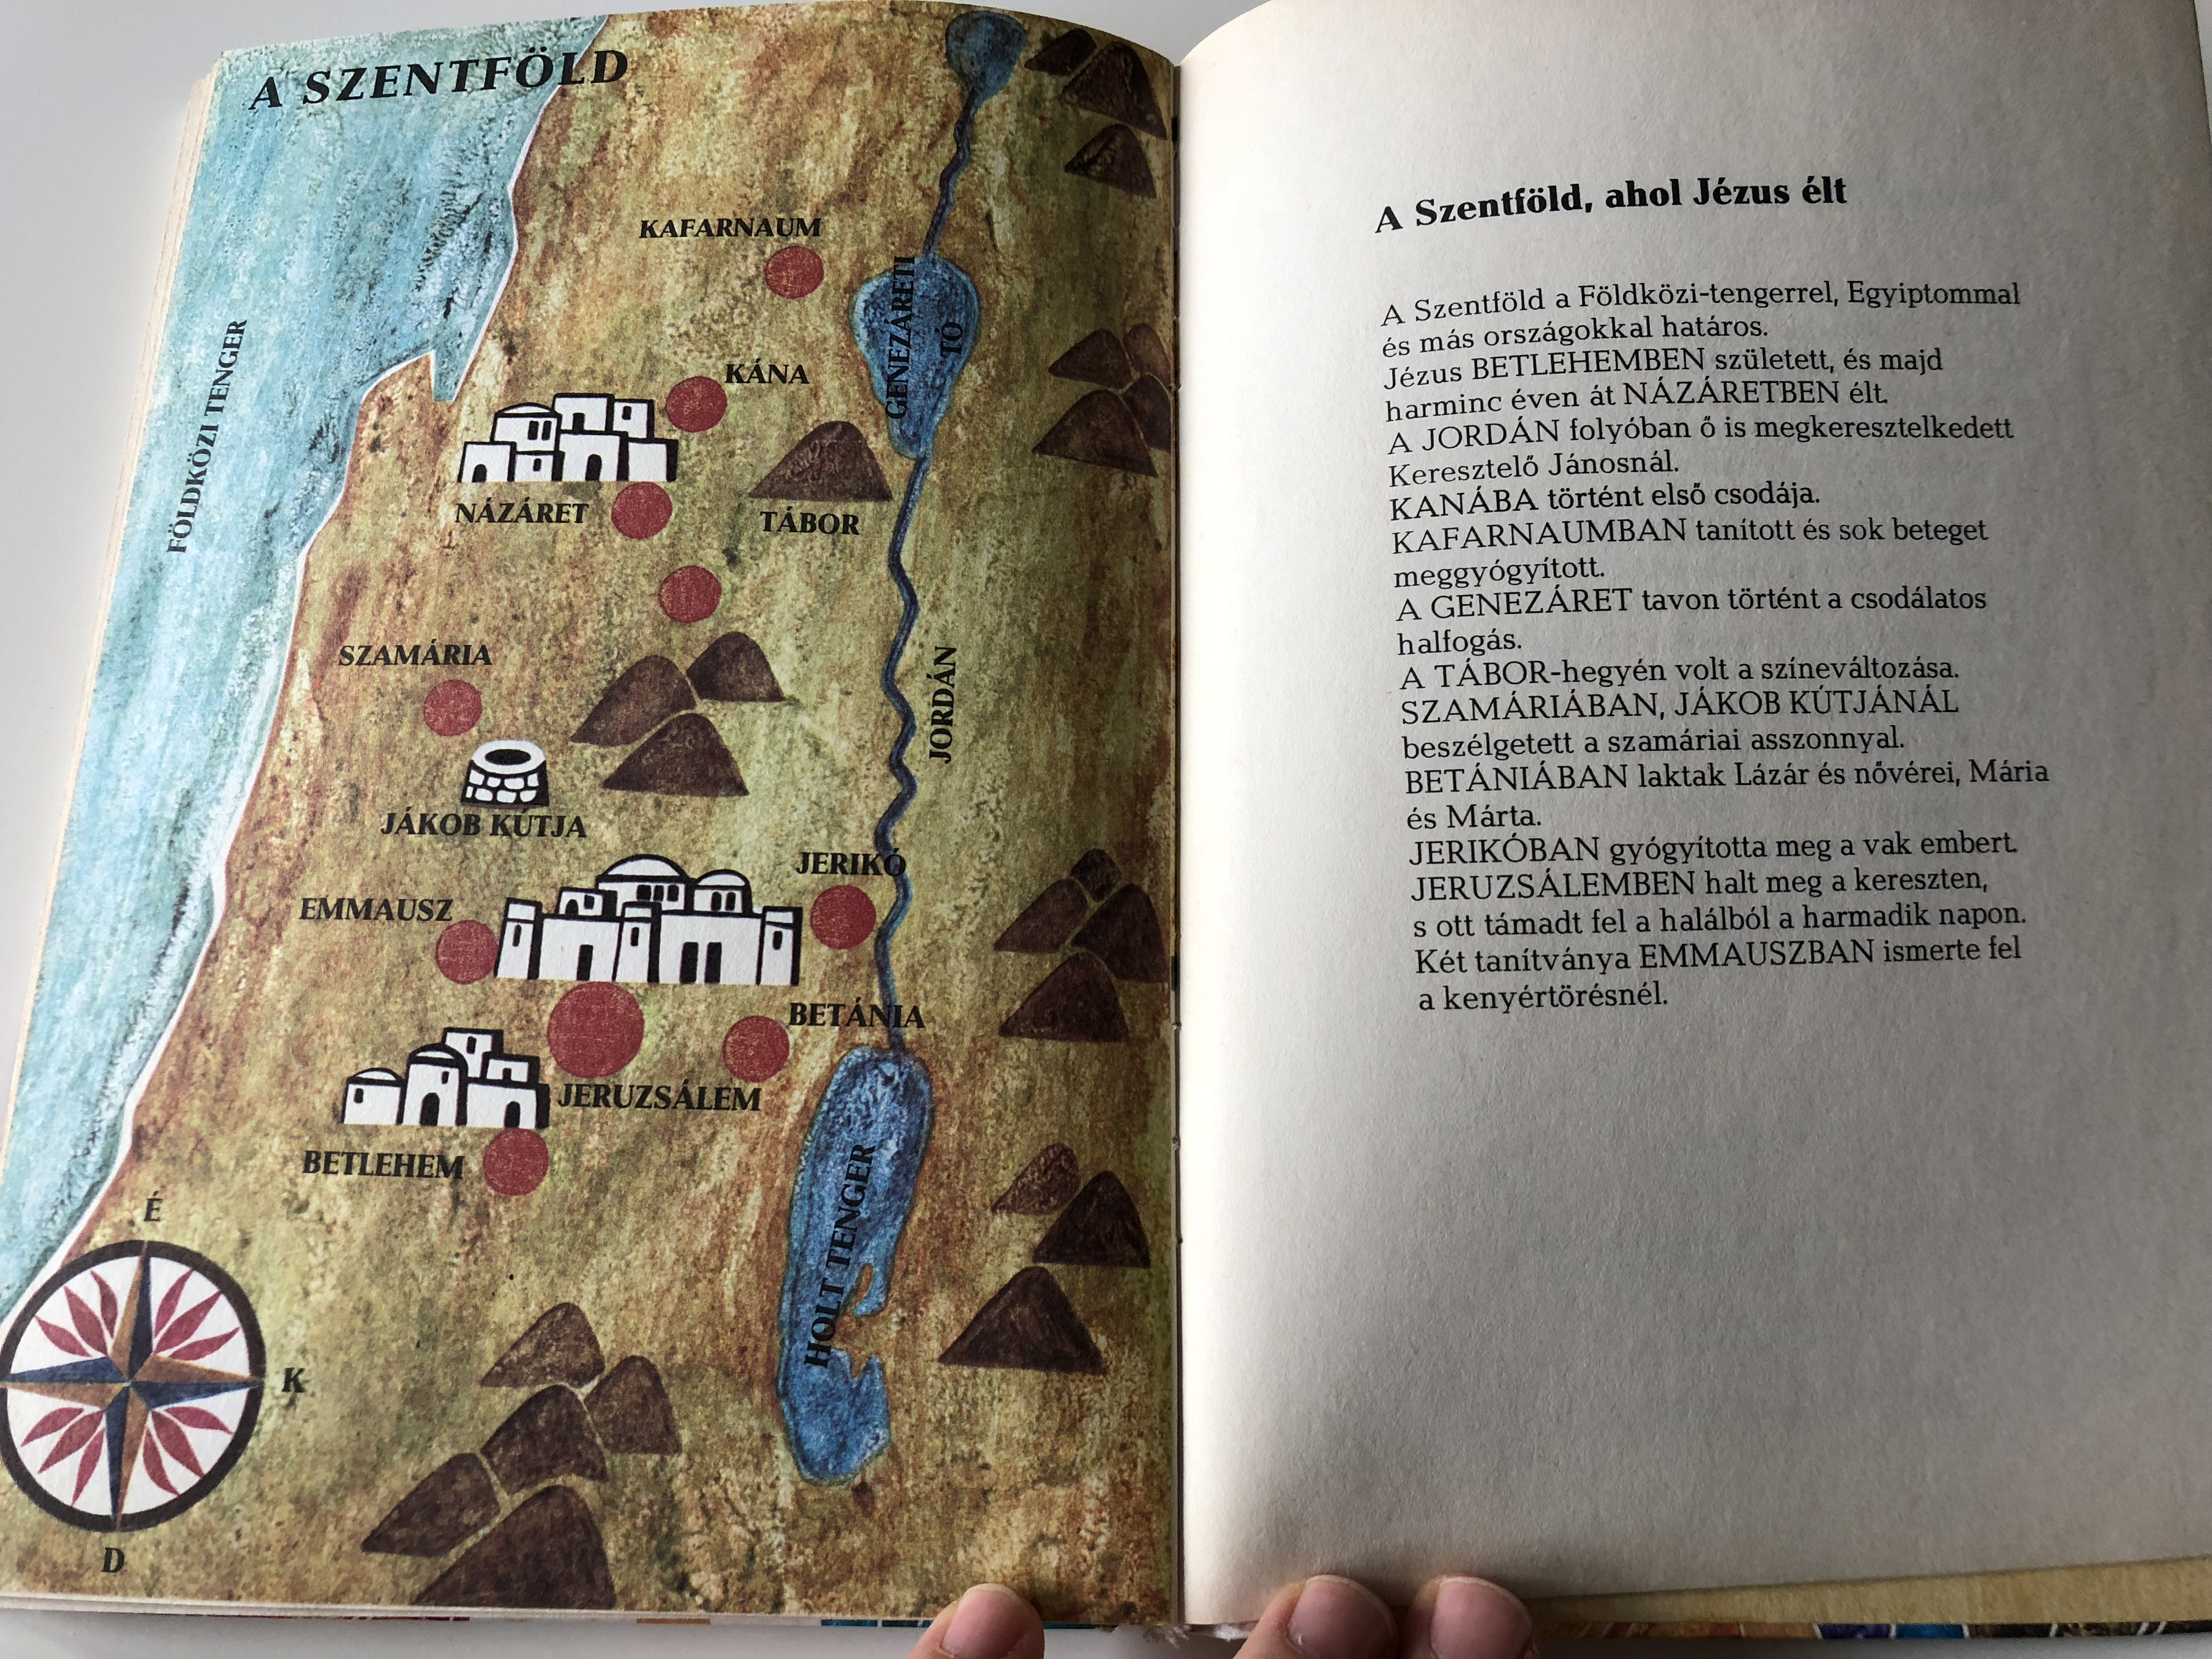 k-pes-evang-lium-by-k.-kammelberger-az-egyh-zi-v-nnepeire-s-vas-rnapjaira-hungarian-translation-of-bilderbibel-zum-neuen-kirchenjahr-illustration-h.-bledl-szent-istv-n-t-rsulat-18-.jpg